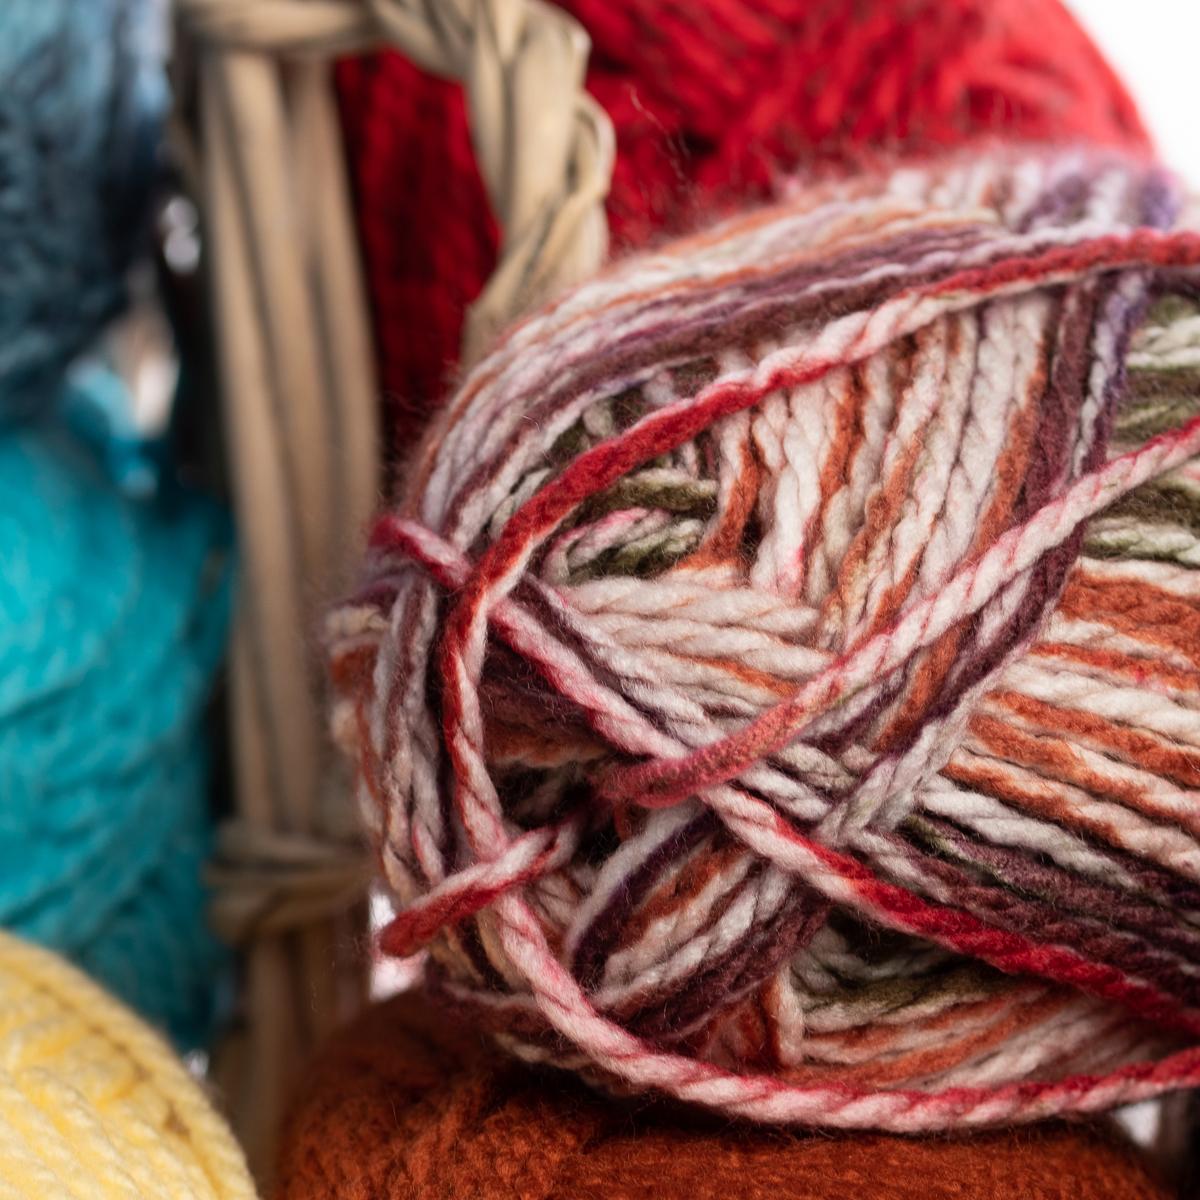 3pk-Premier-Yarns-Deborah-Norville-Serenity-100-Acrylic-Yarn-Chunky-5-Knitting thumbnail 64